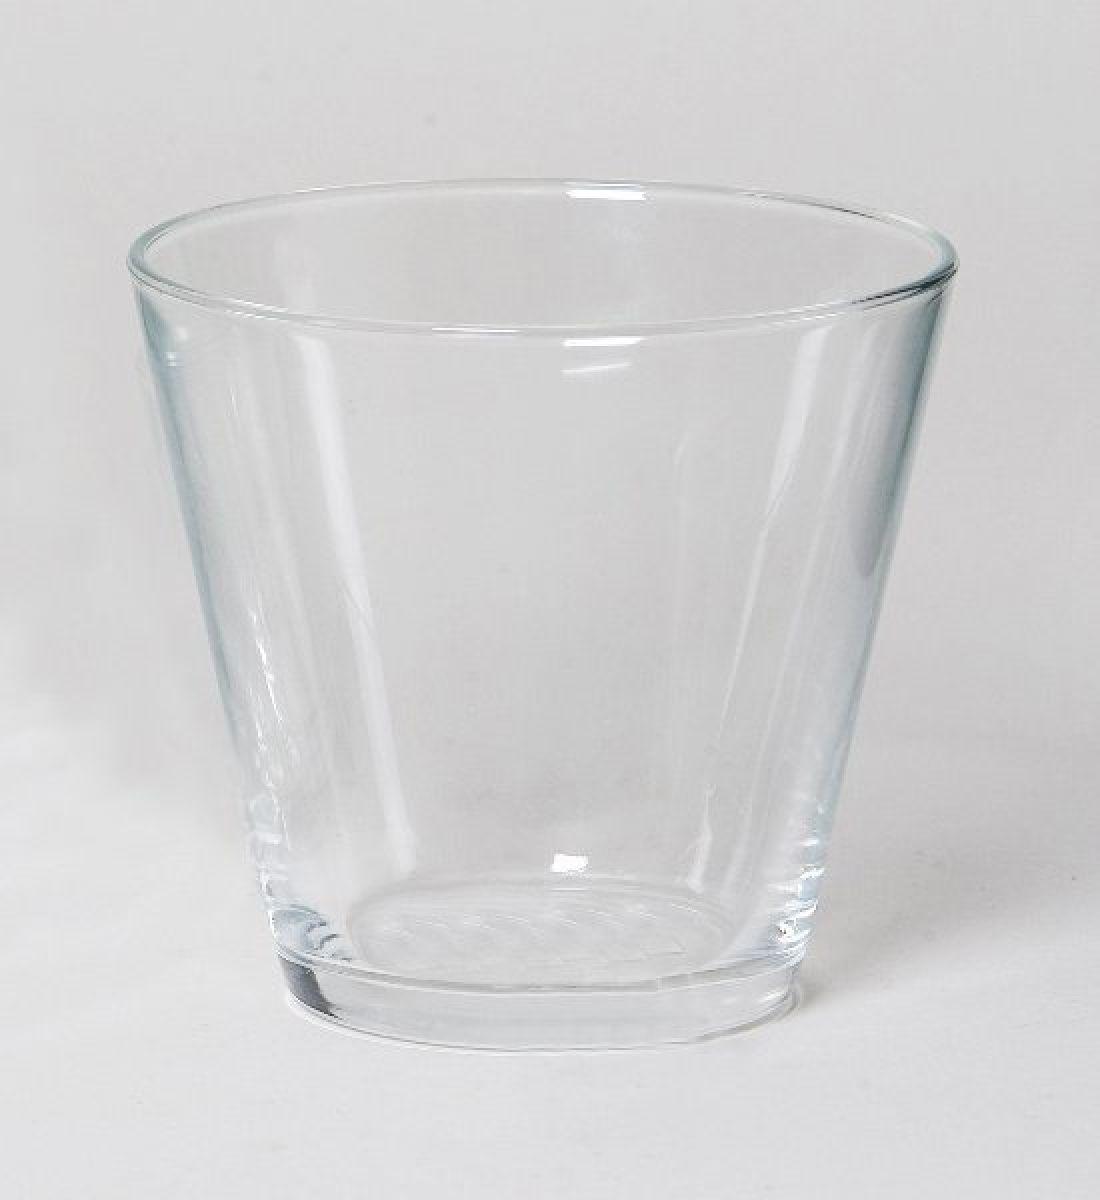 Koni. Glaskübel KLAR 1947-12 71256 Ø12x11cm pressglas